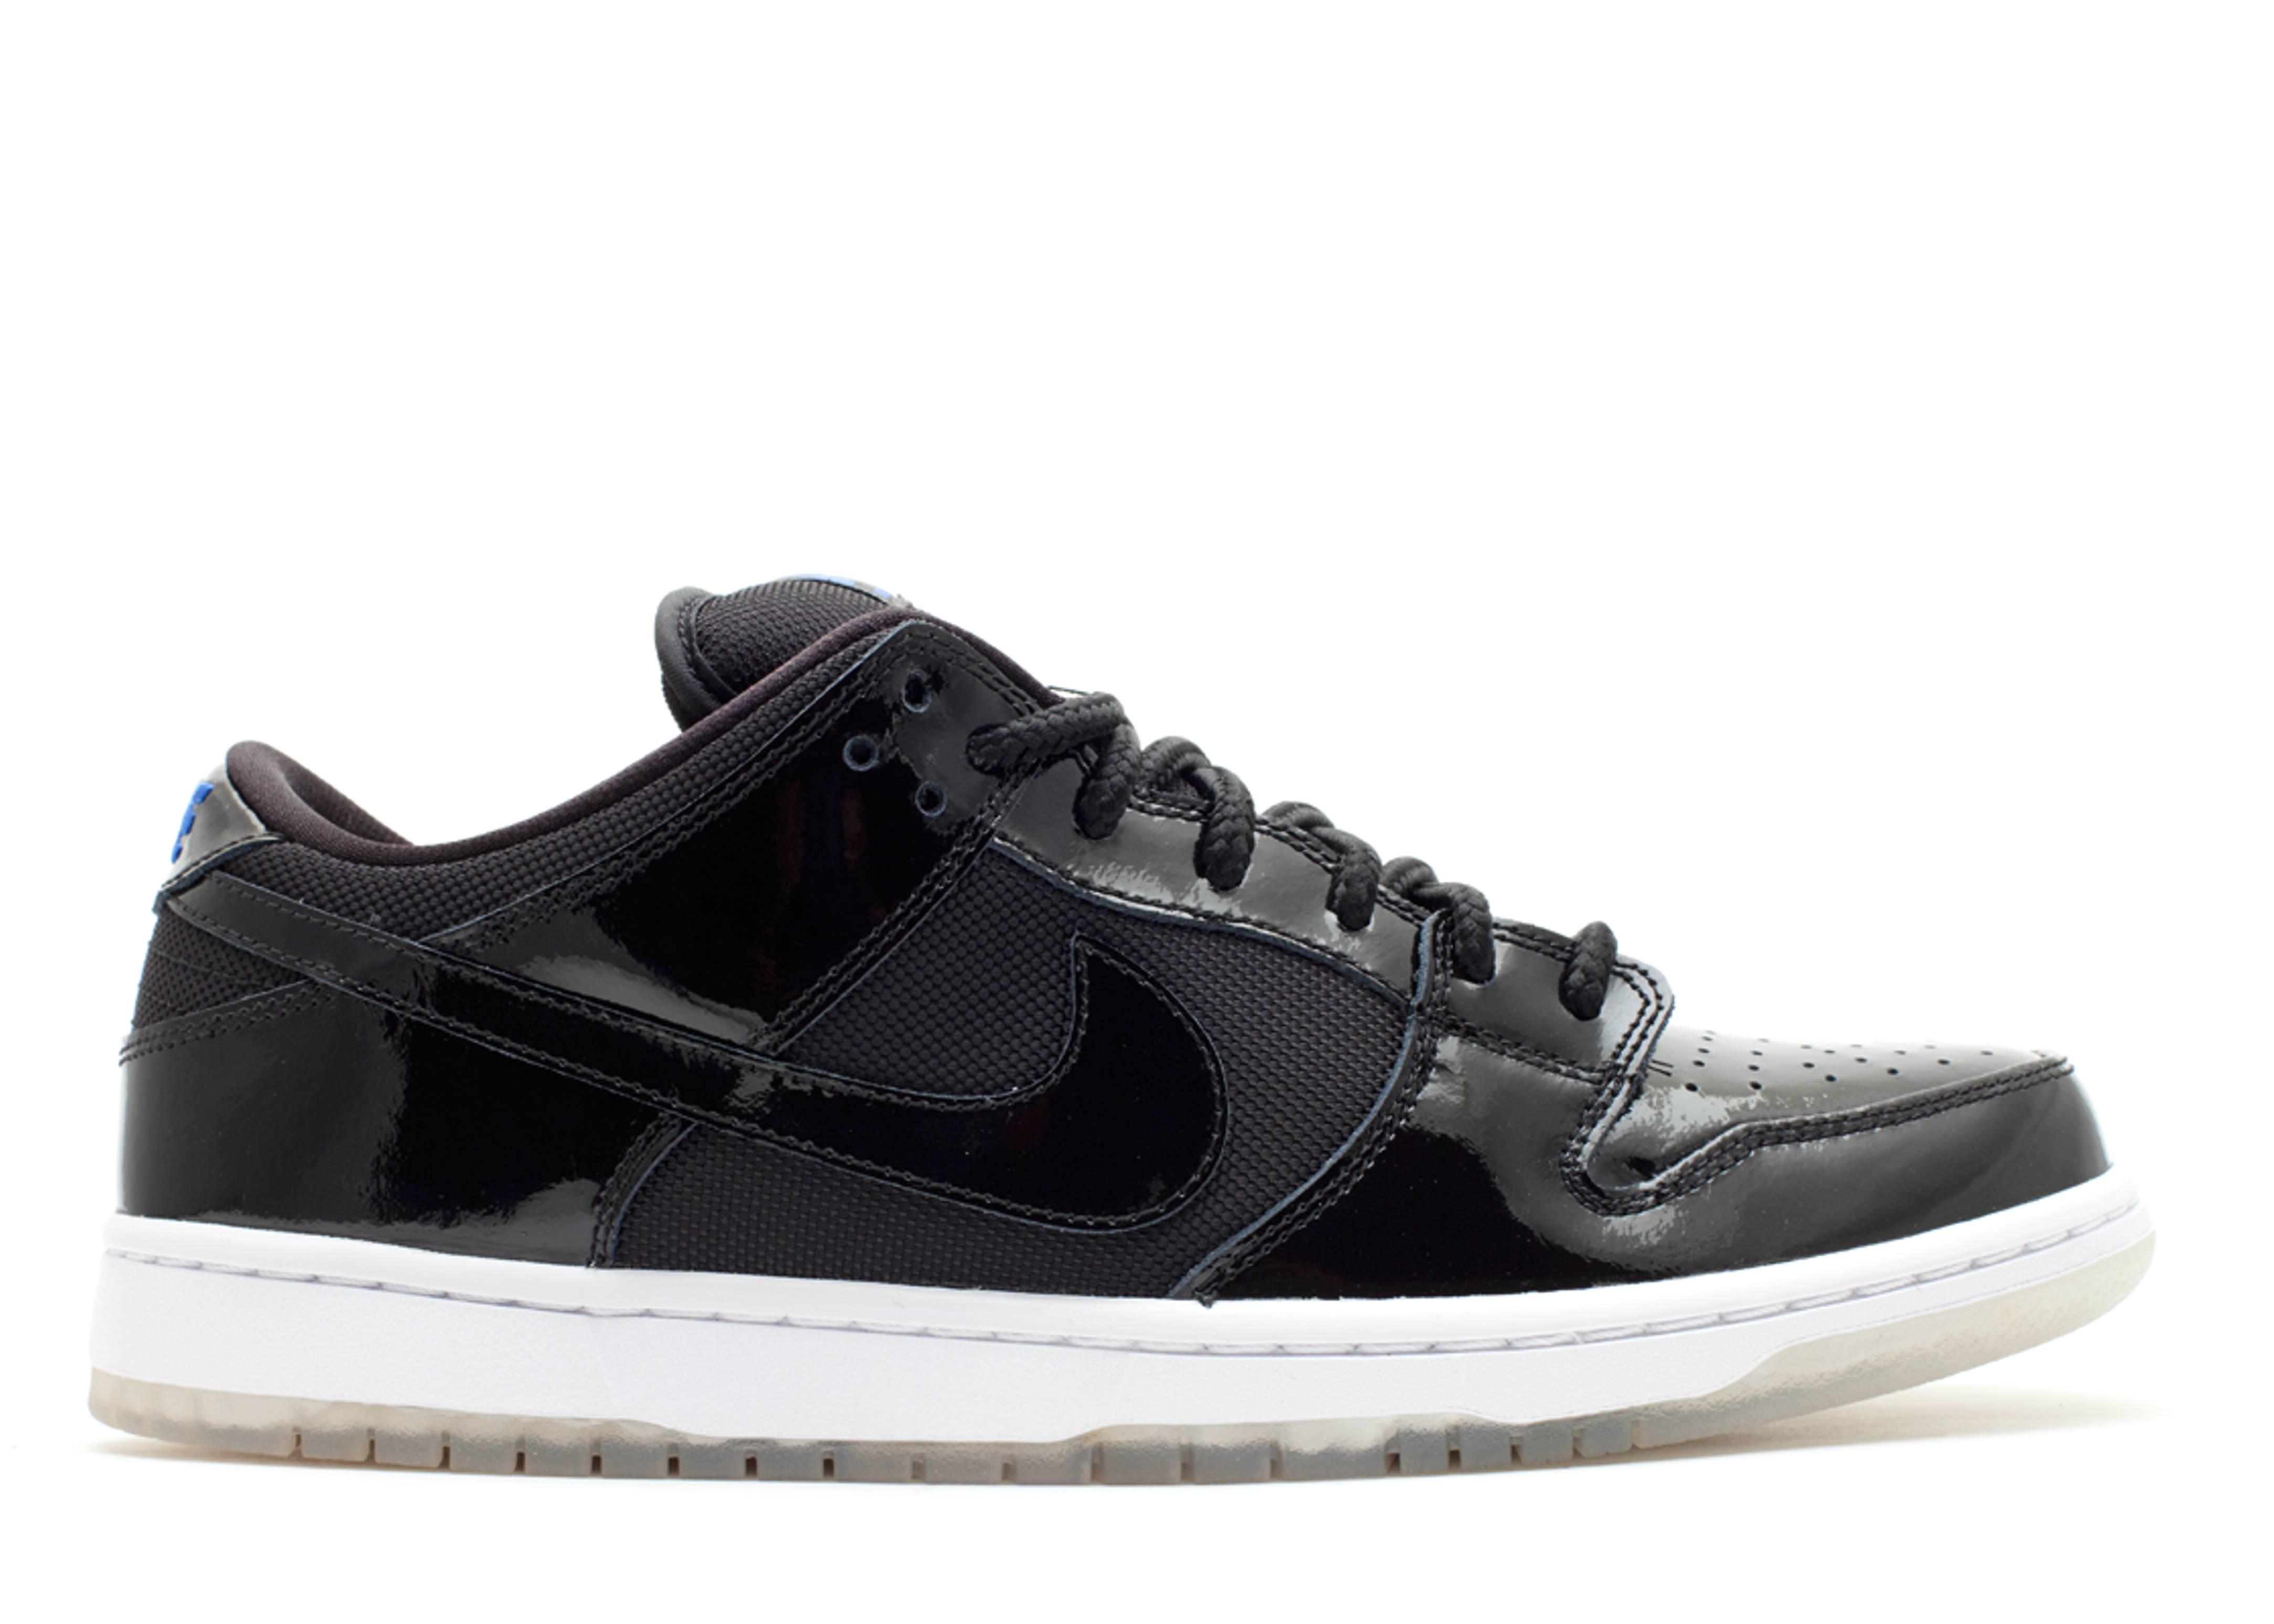 "Dunk Low Pro Sb ""space Jam"" - Nike - 304292 021 - black ..."